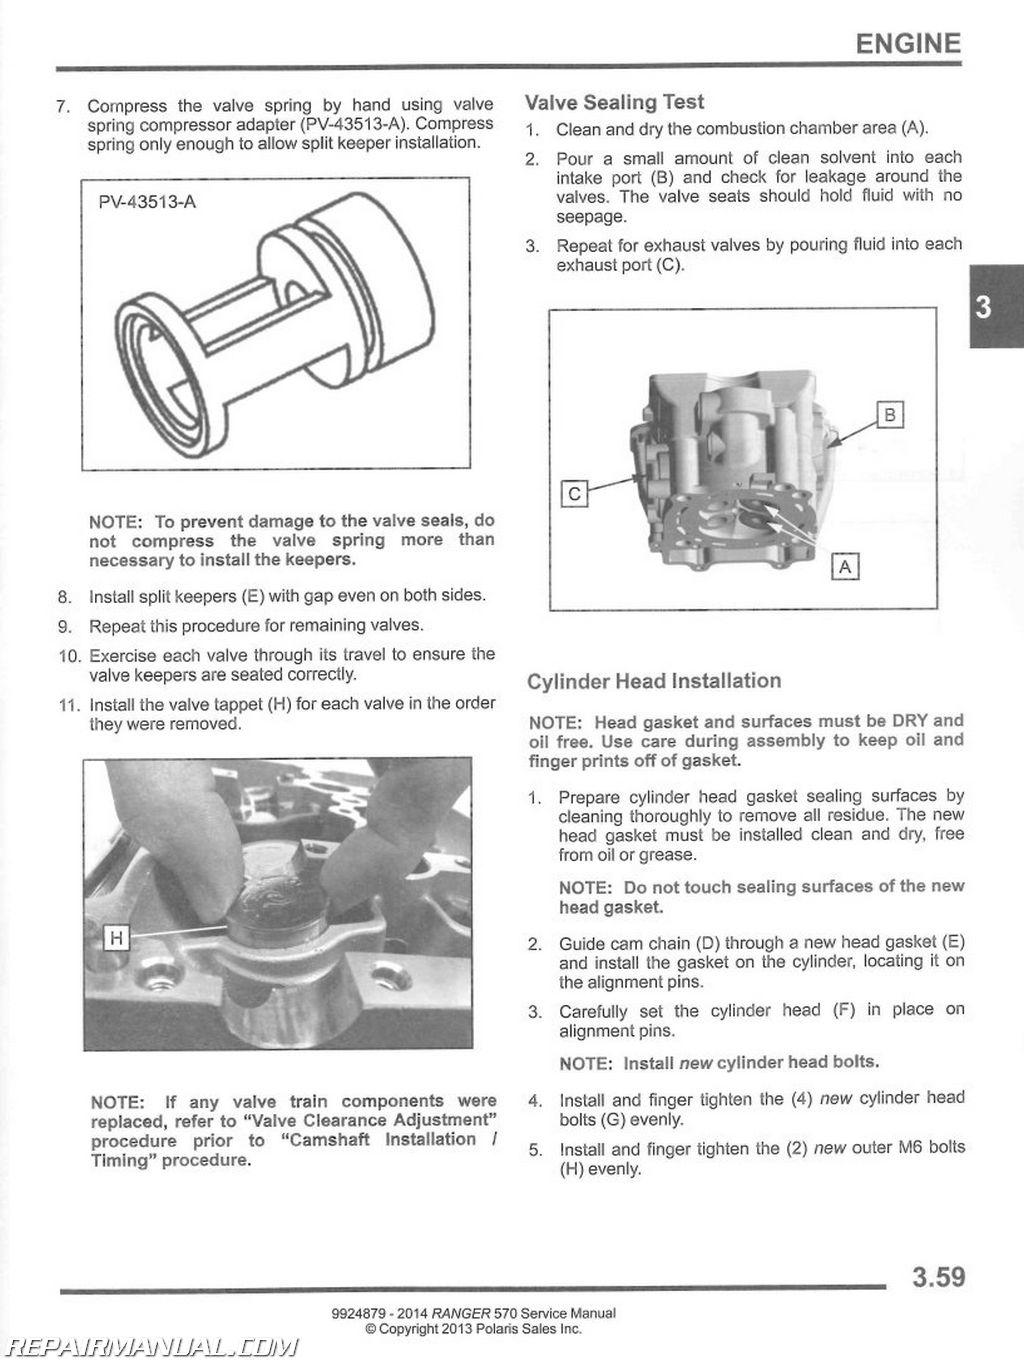 hight resolution of 2014 polaris ranger 570 side by side service manual polaris vent line diagram polaris trailblazer 250 carburetor diagram